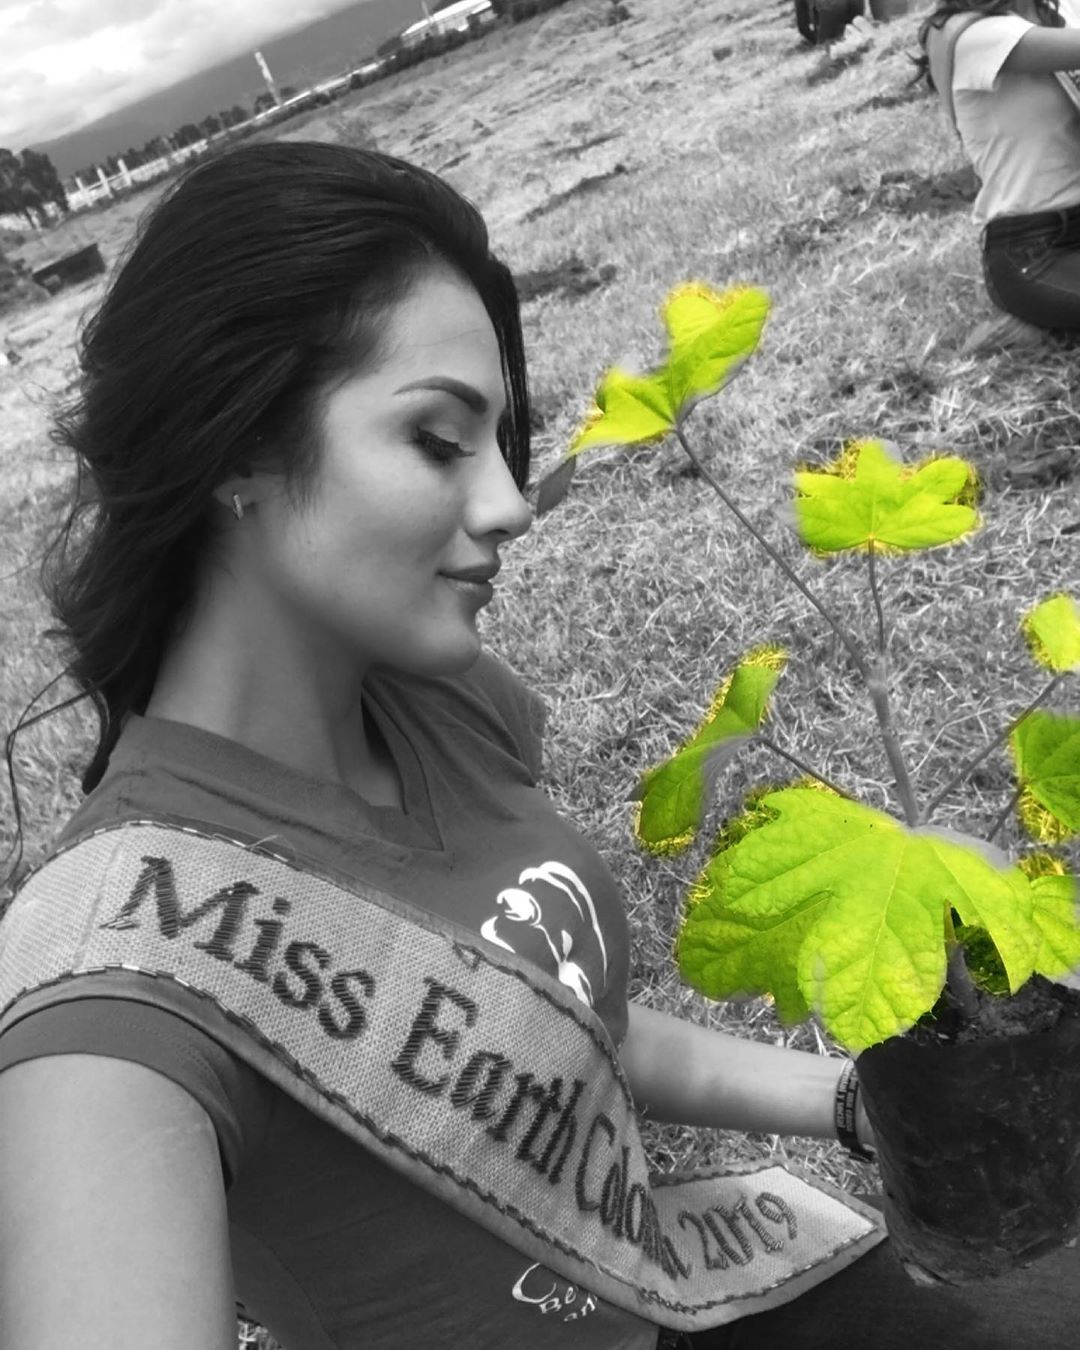 yenny katherine carrillo, top 20 de miss earth 2019/reyna mundial banano 2017. - Página 5 70036311